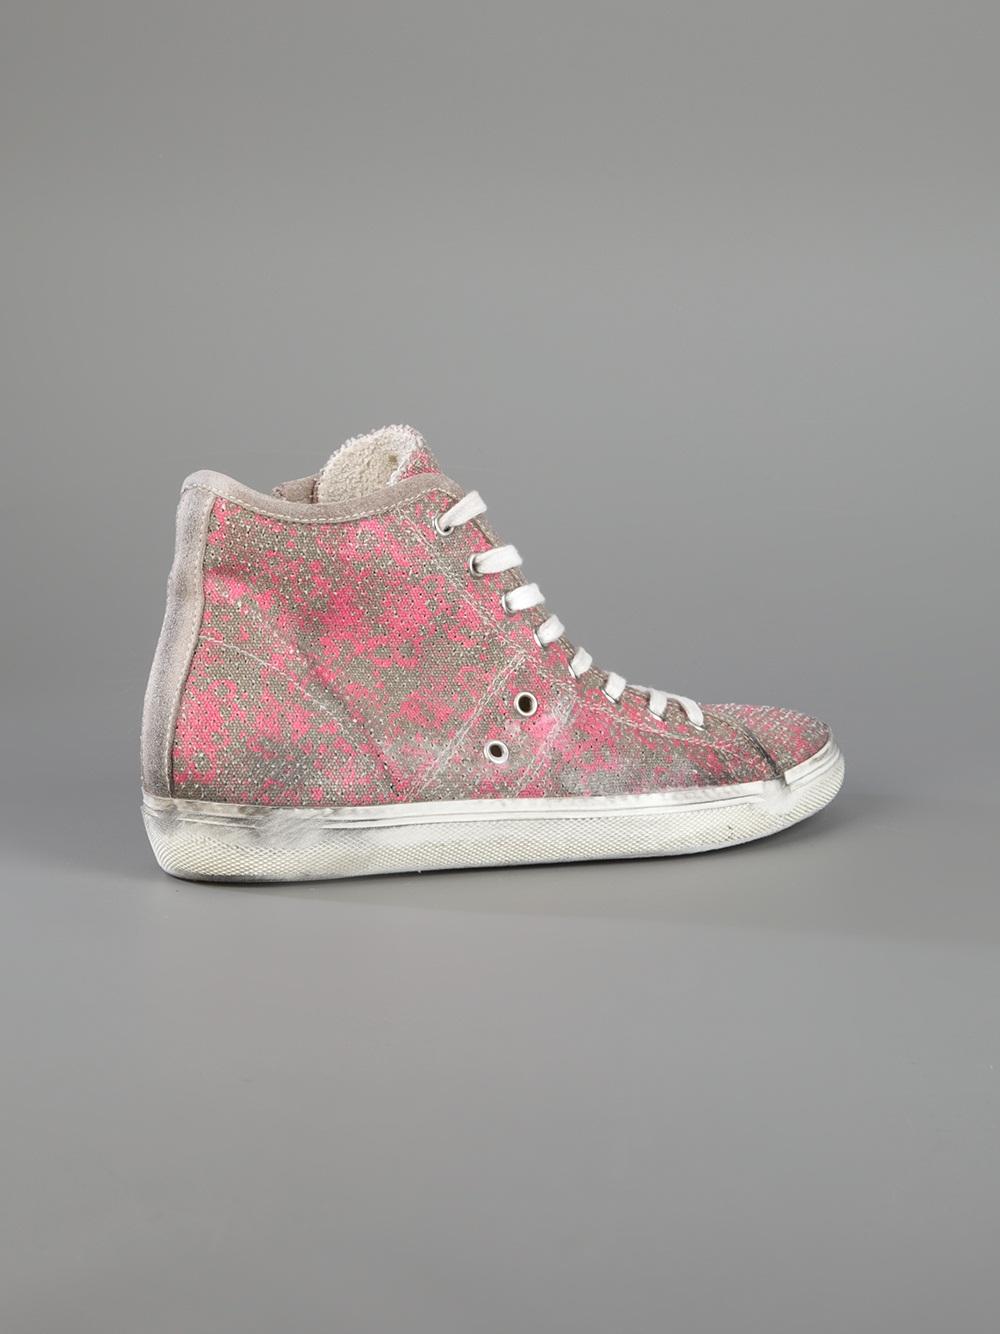 Leather Crown High Top Sneaker in Pink & Purple (Pink)